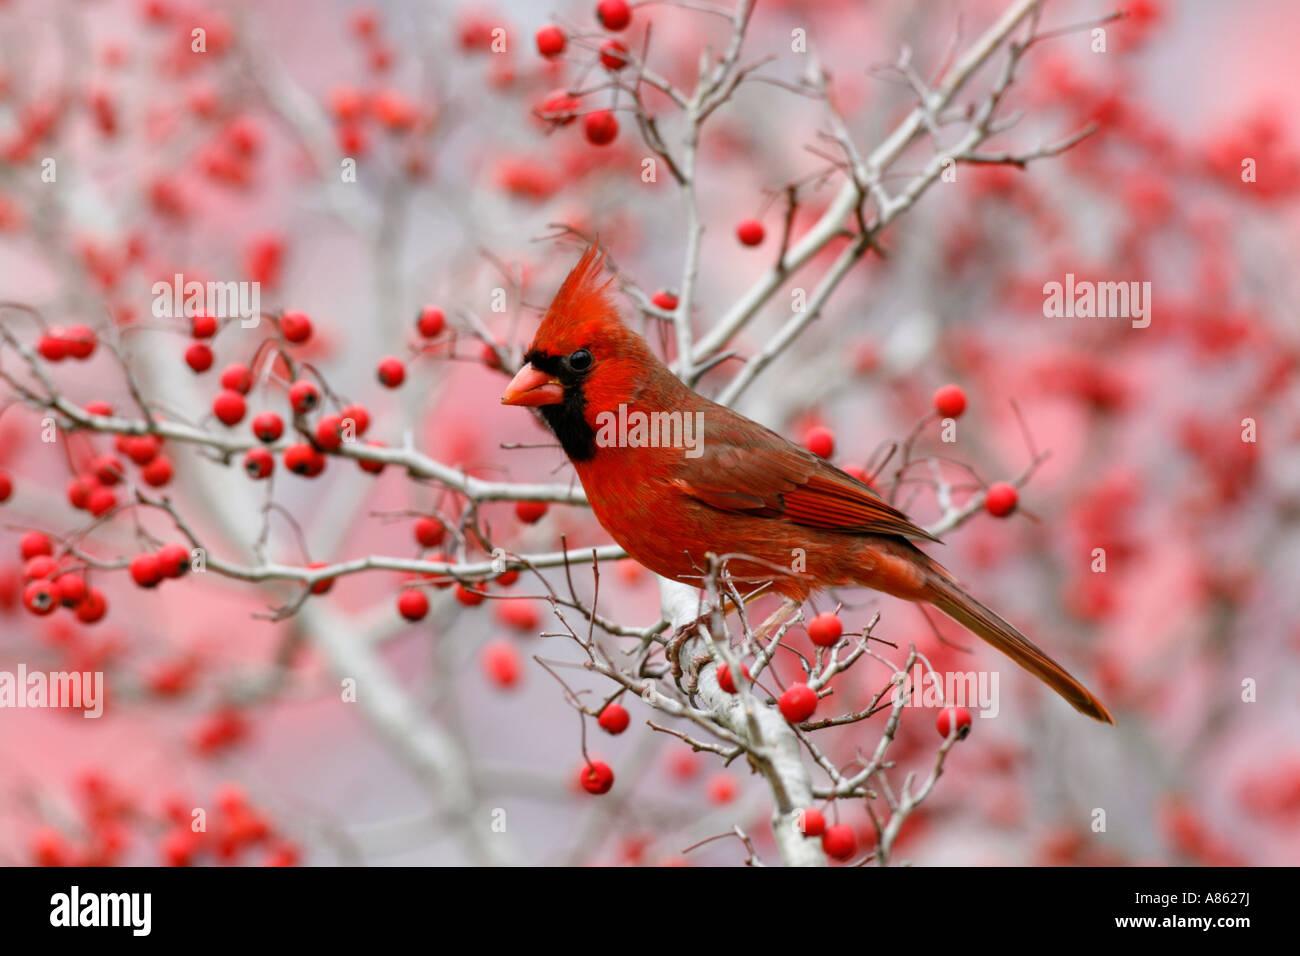 Male Northern Cardinal in Hawthorn Tree - Stock Image